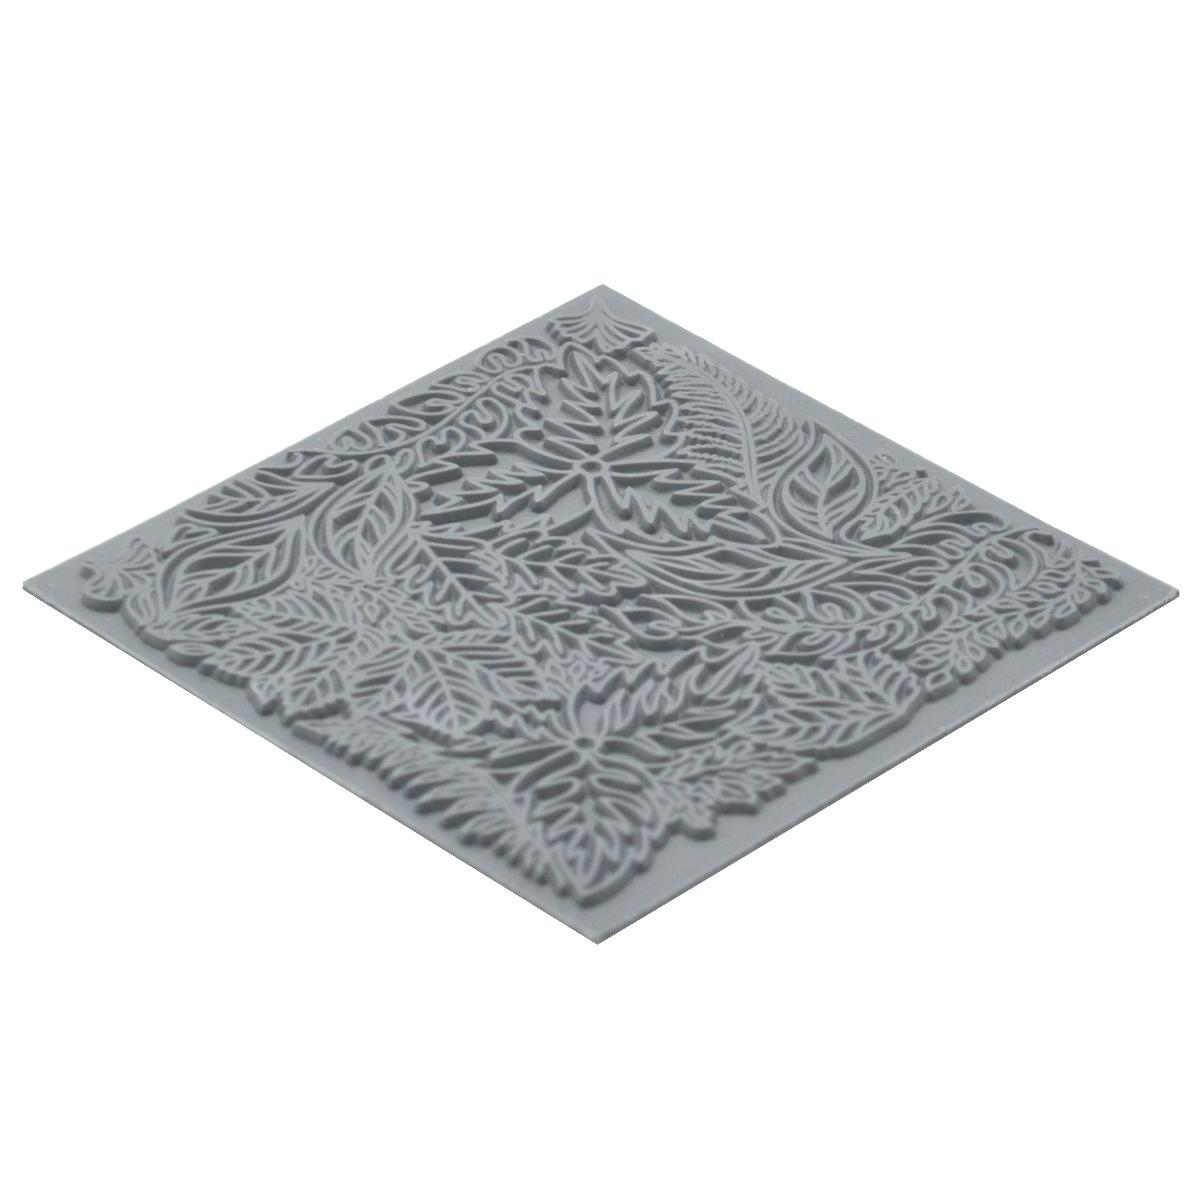 CE95022 Текстура для пластики резиновая 'Листья', 9х9 см